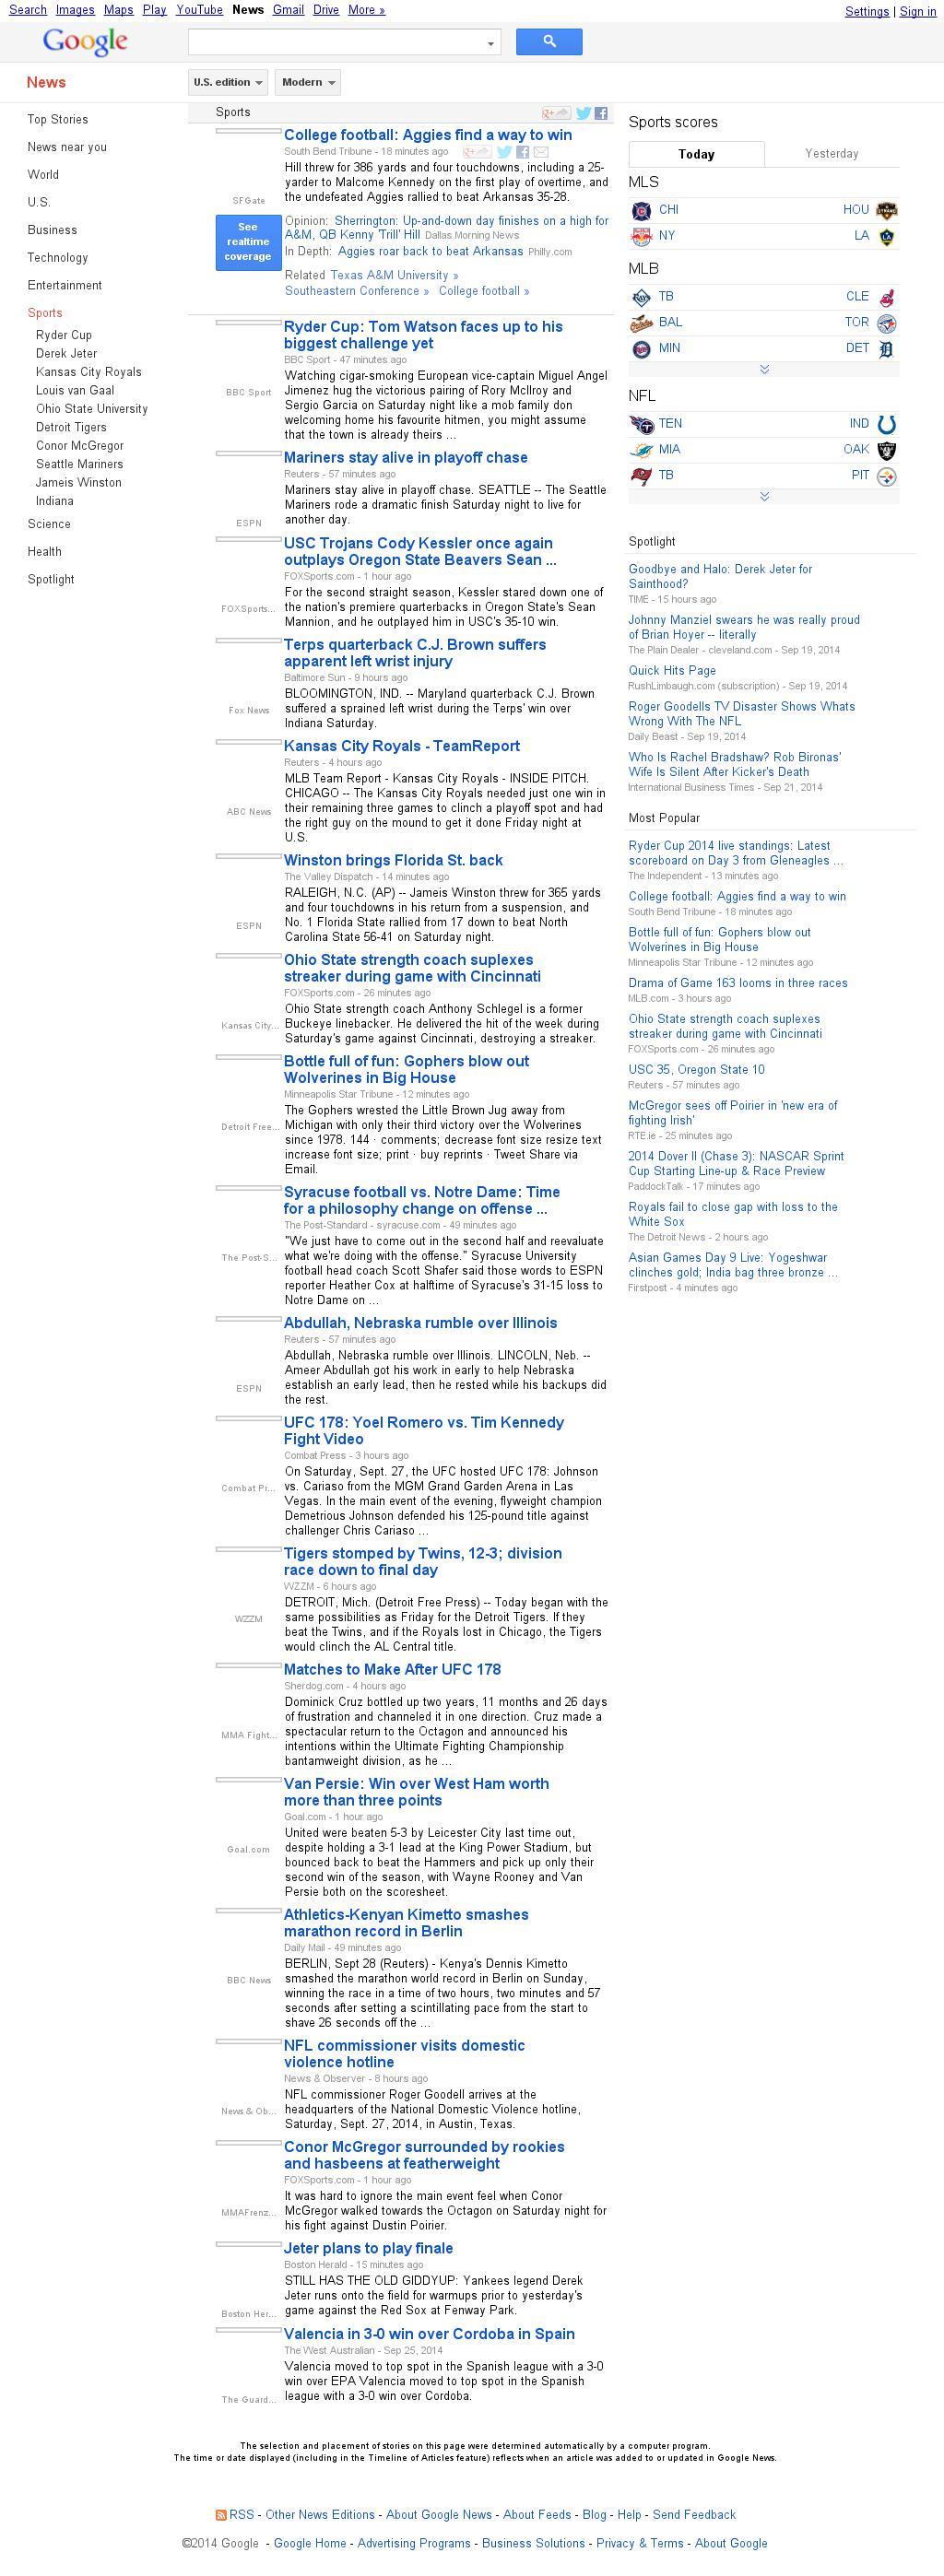 Google News: Sports at Sunday Sept. 28, 2014, 11:06 a.m. UTC